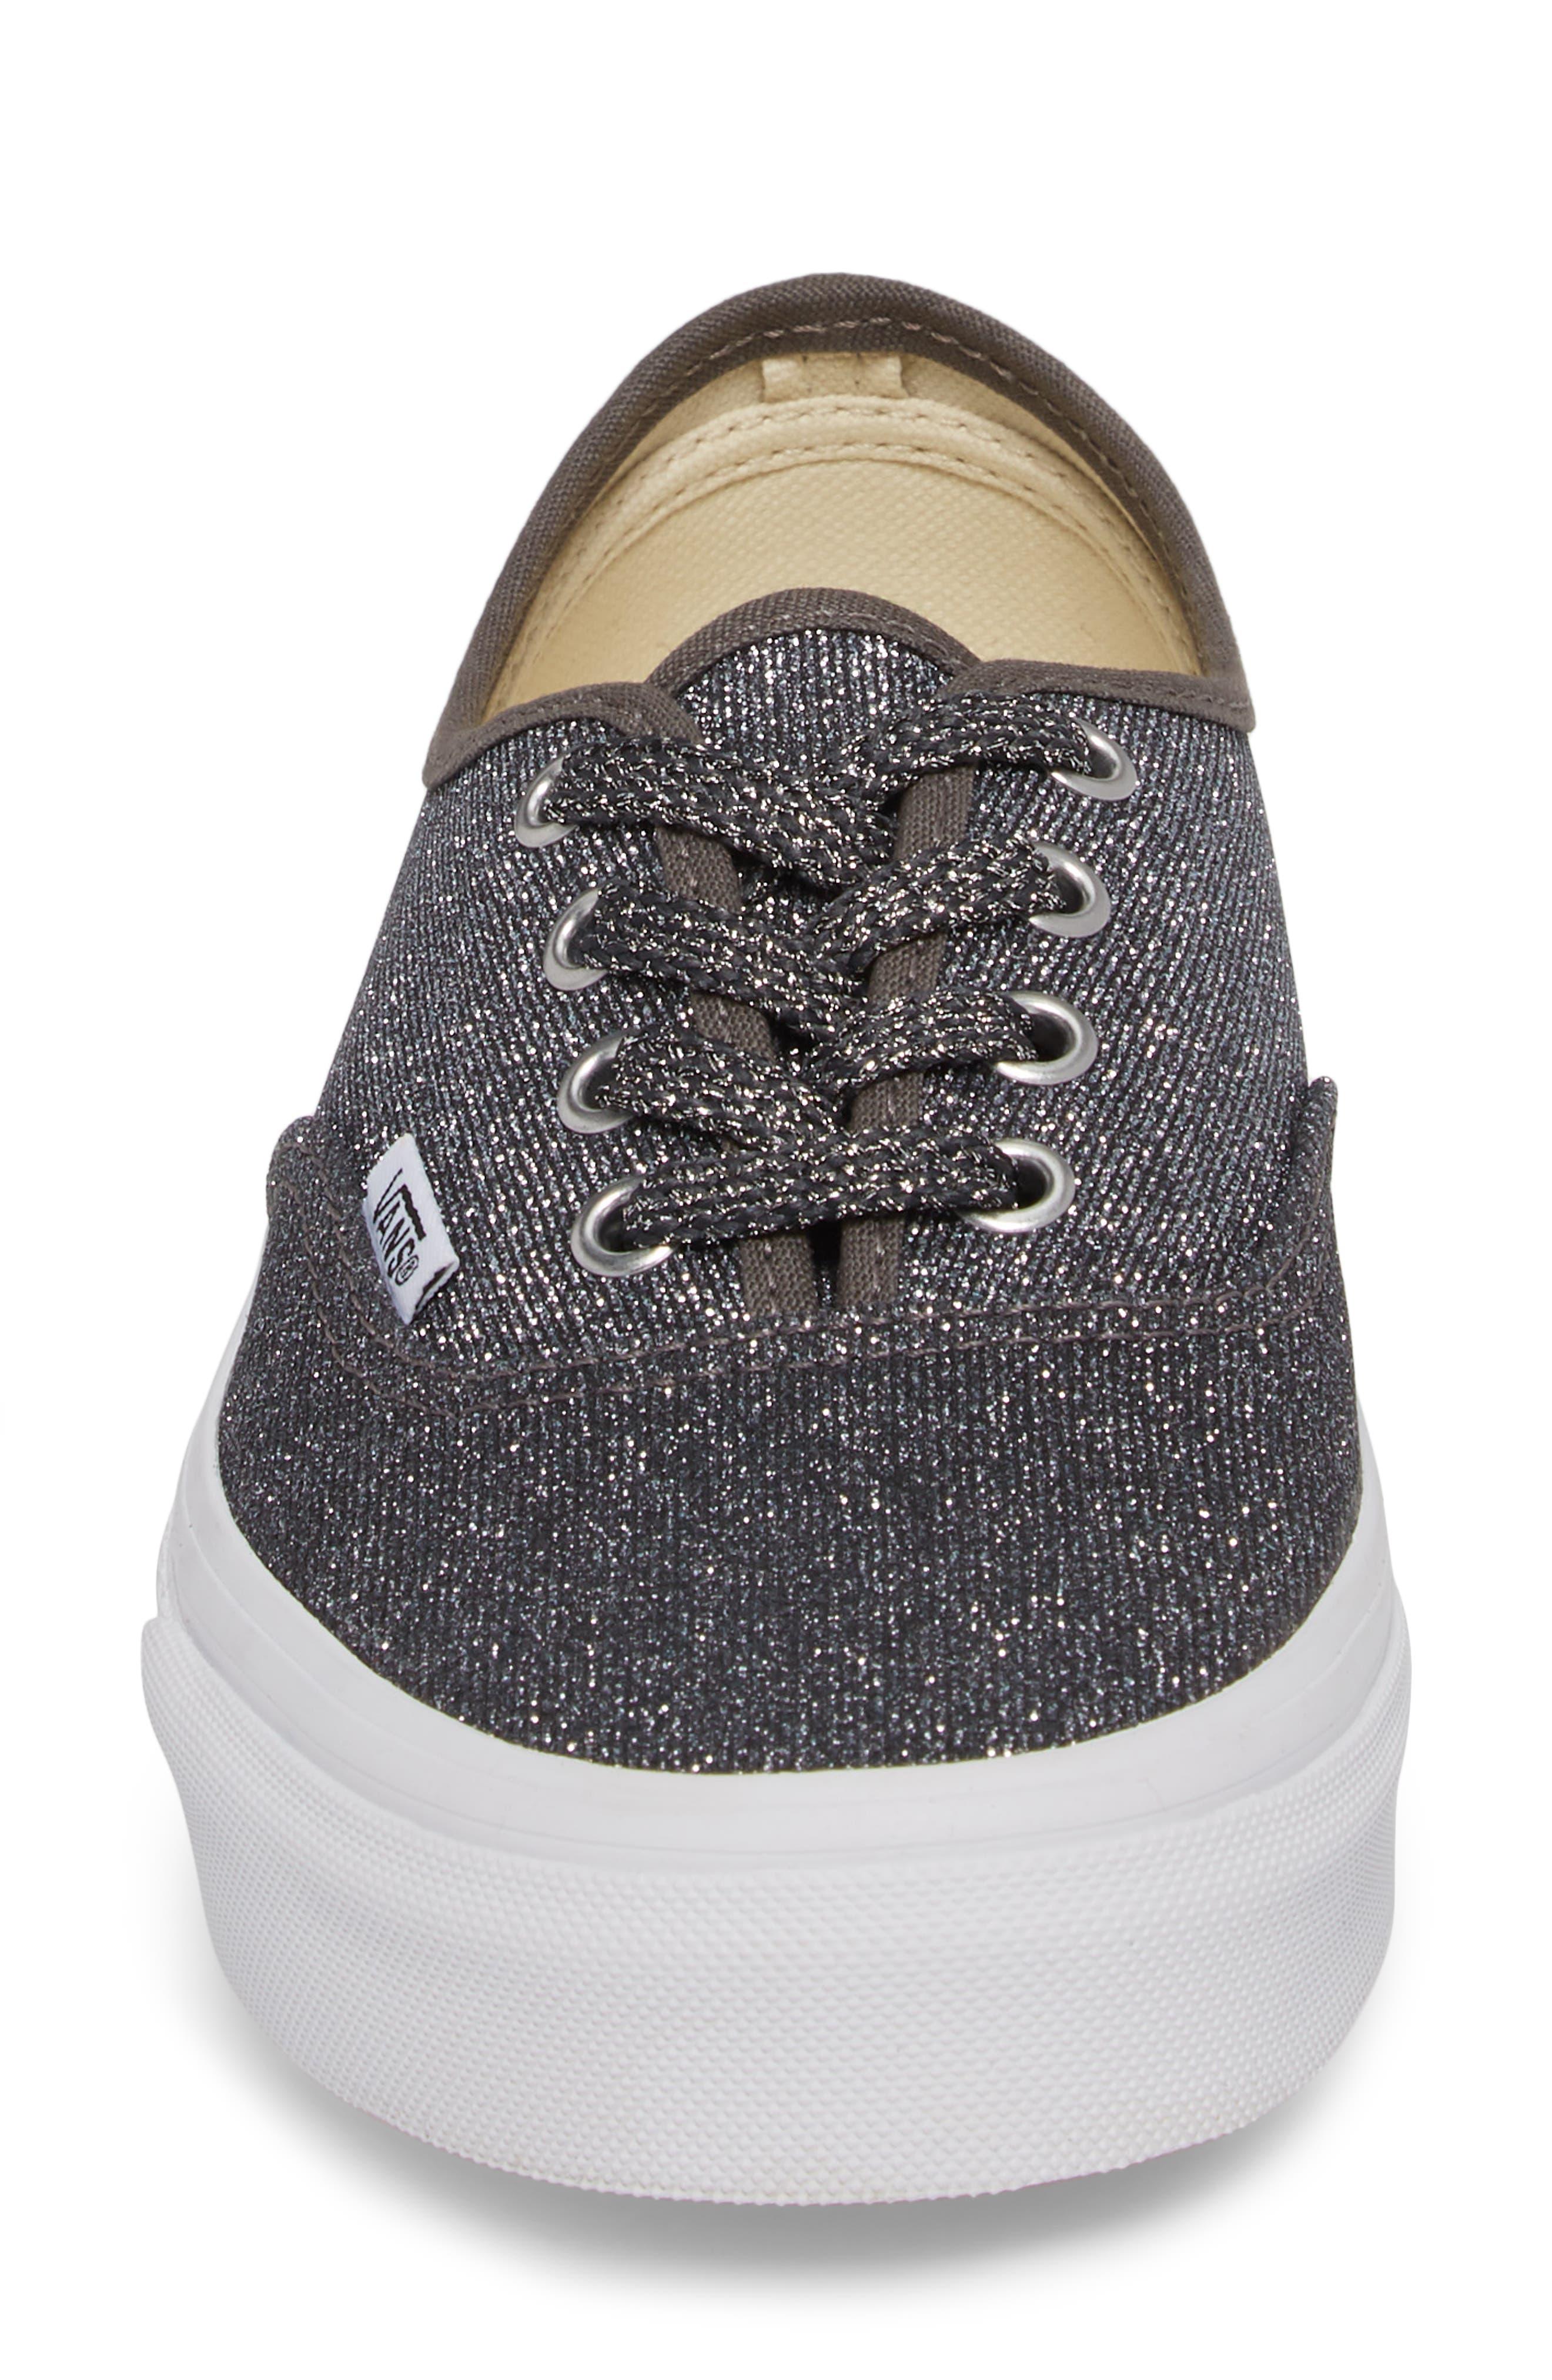 UA Authentic Lurex Sneaker,                             Alternate thumbnail 4, color,                             BLACK/ TRUE WHITE GLITTER